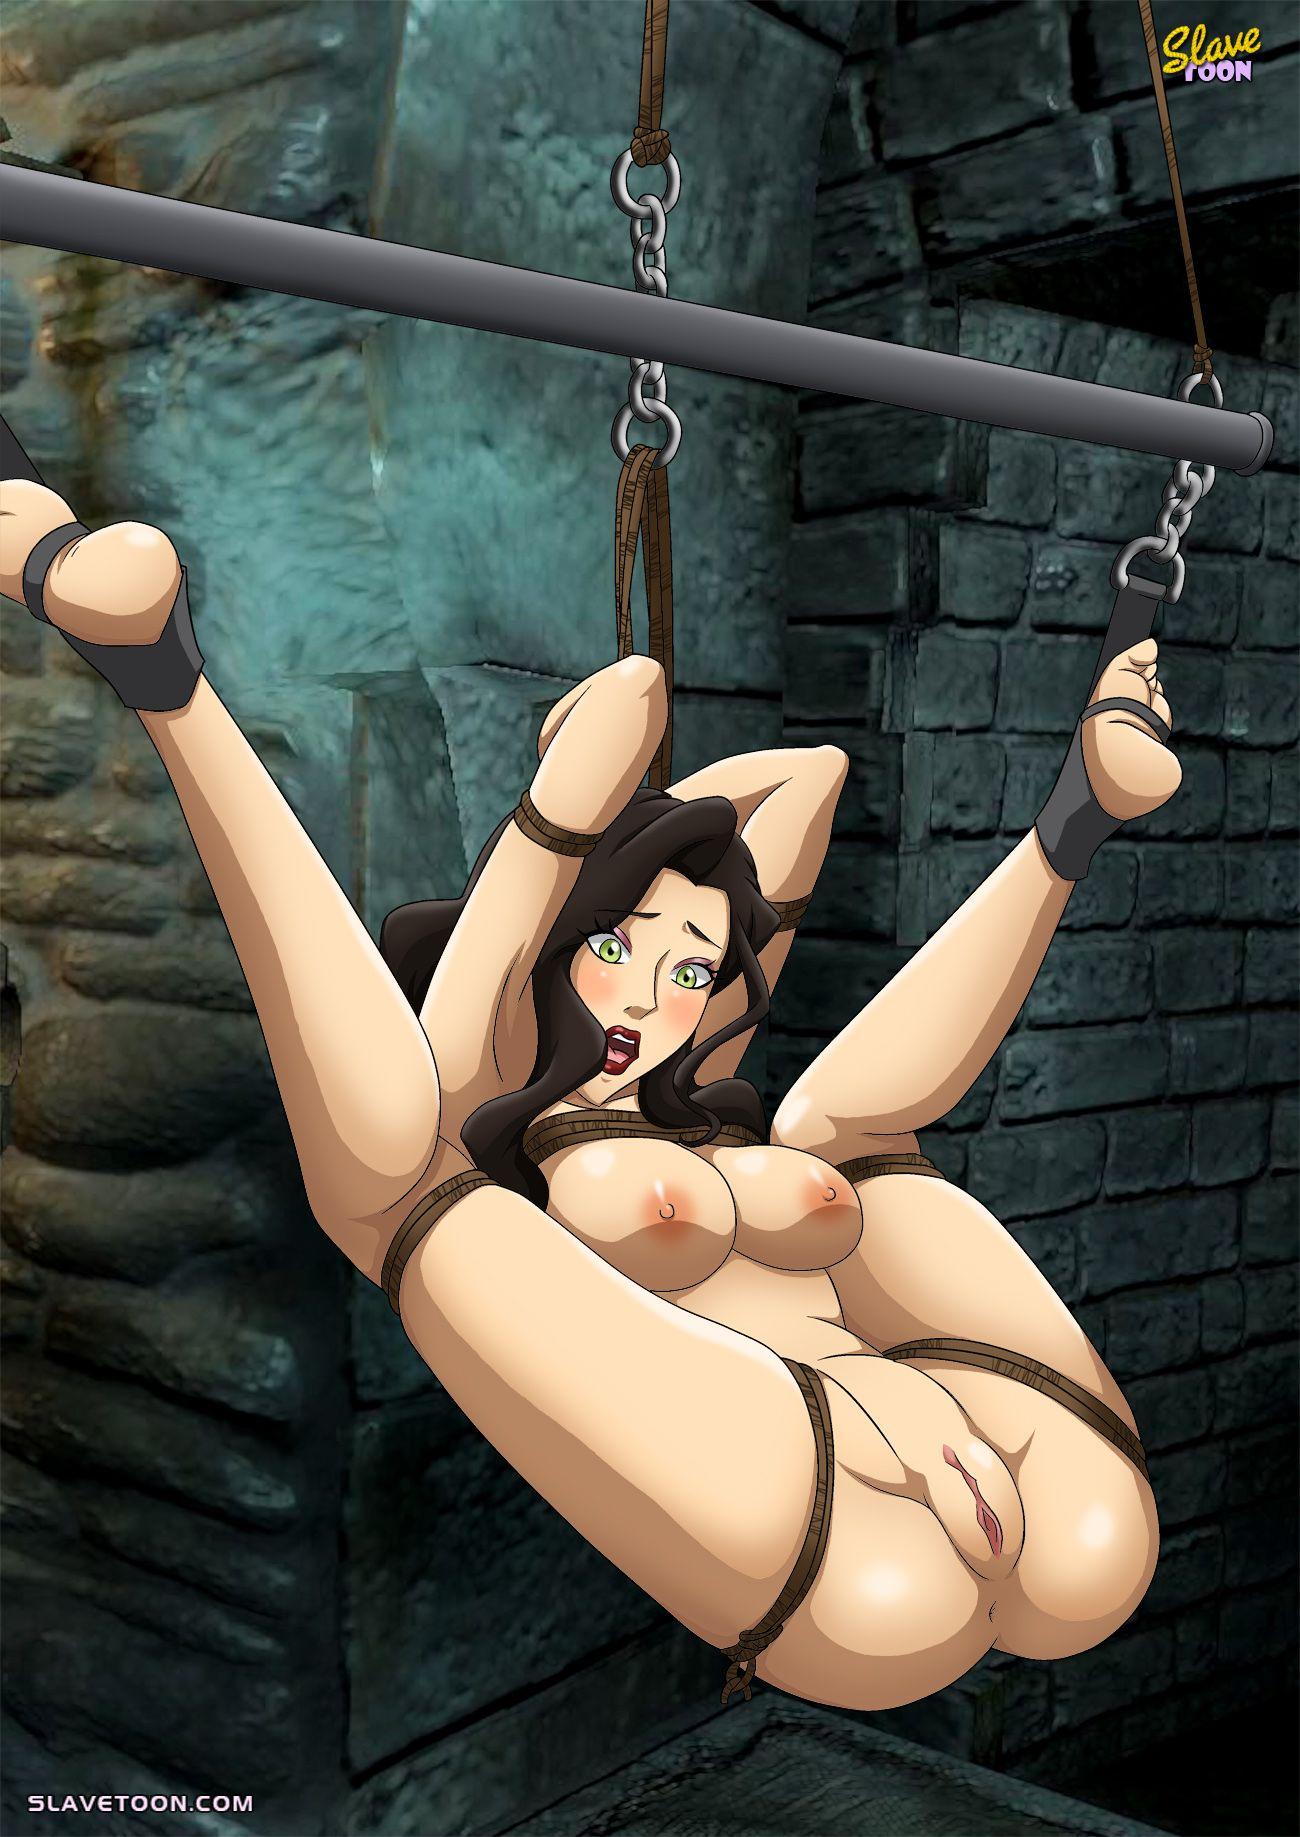 Avatar Korra Yuri Porn - Avatar Porn Legend Of Korra